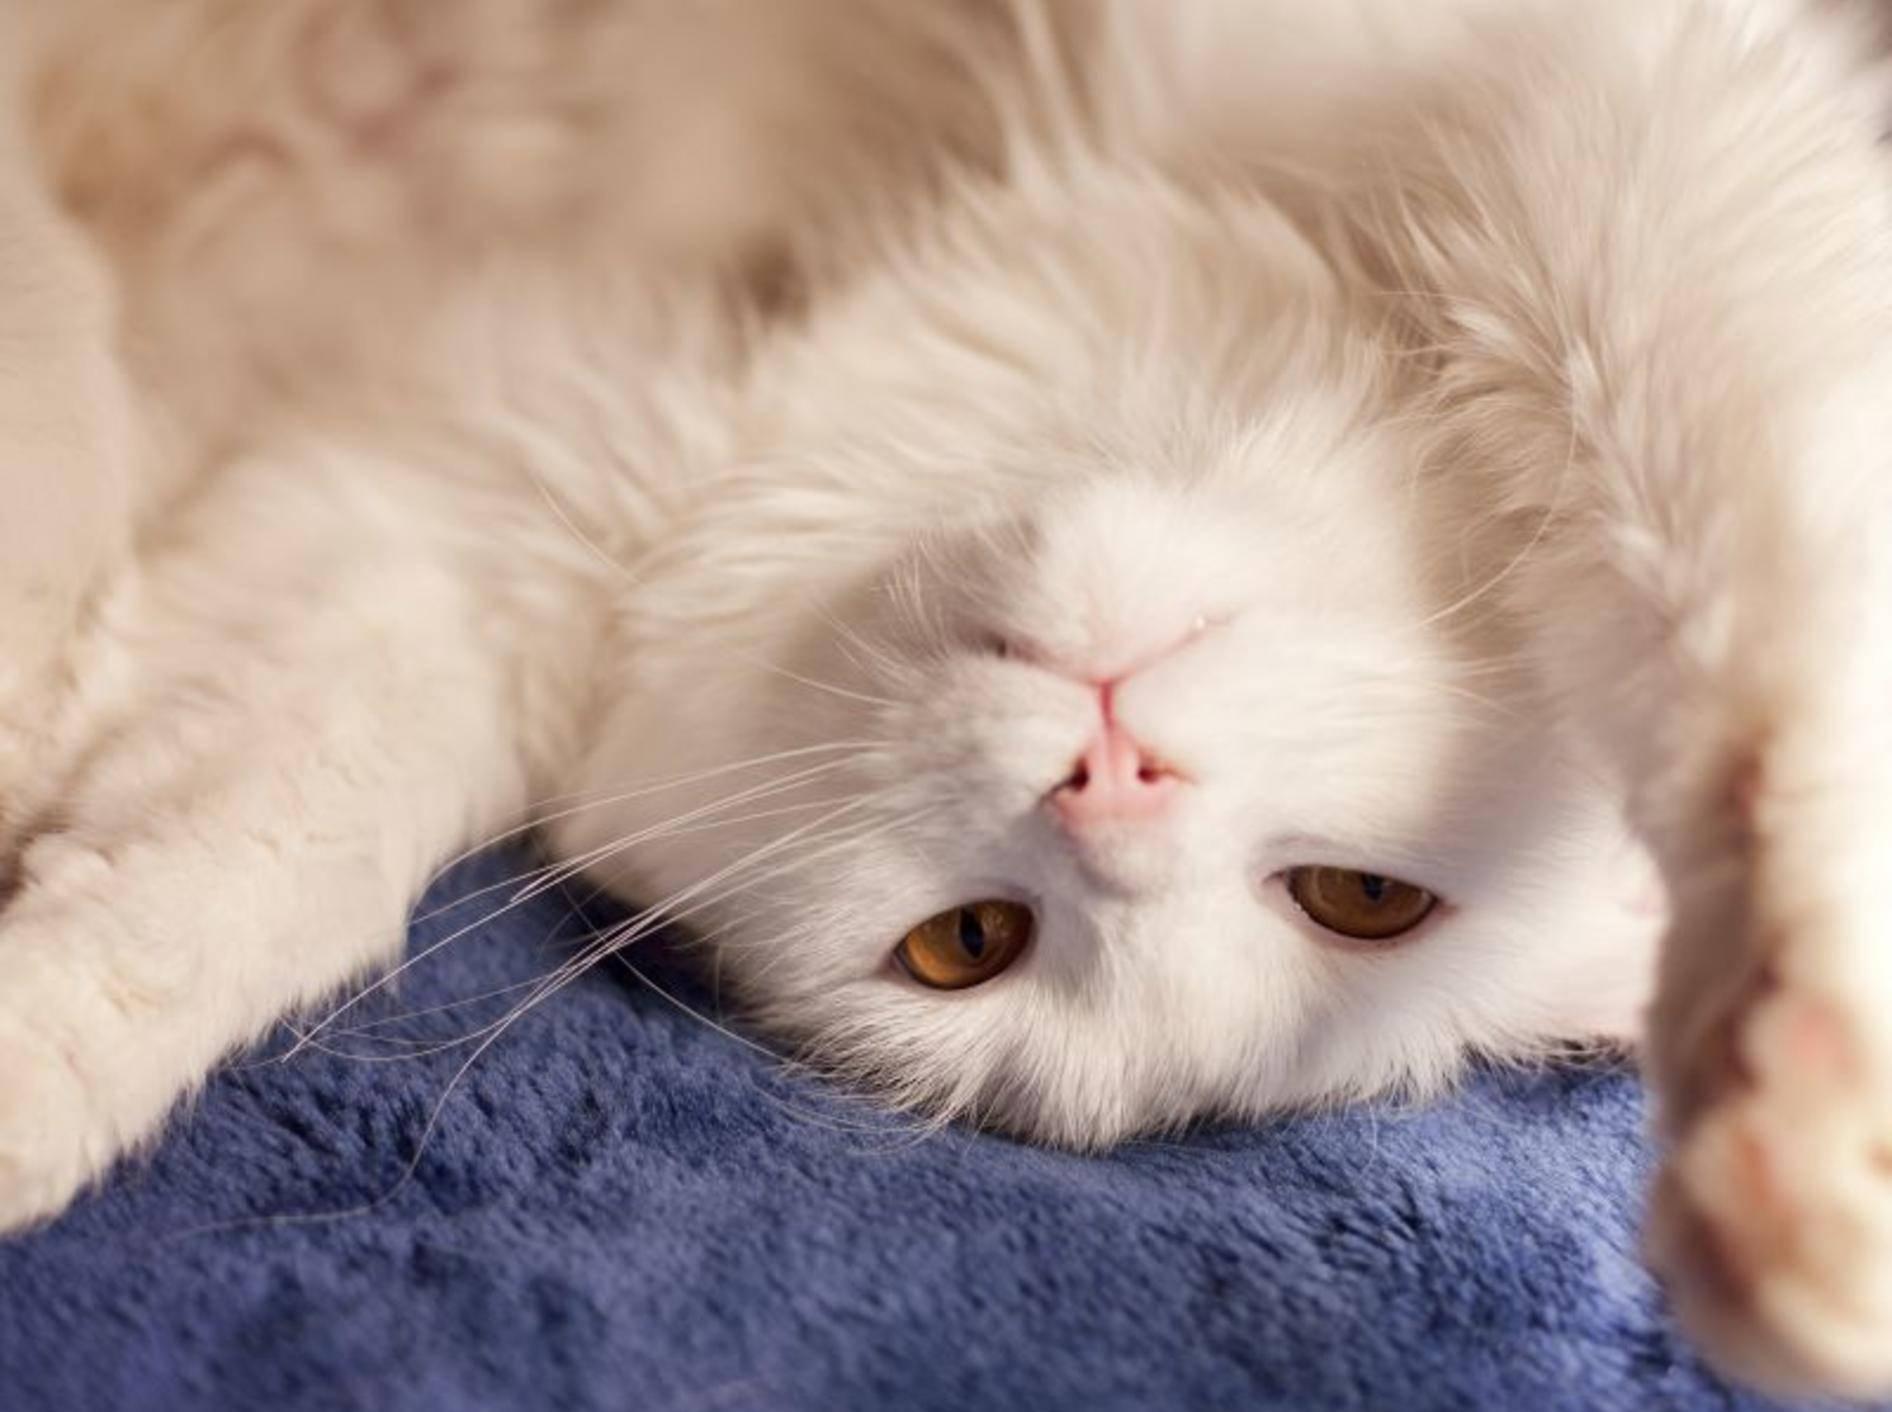 Langhaarkatzen pflegen: 5 Tipps gegen Knoten im Fell — Bild: Shutterstock / DreamBig